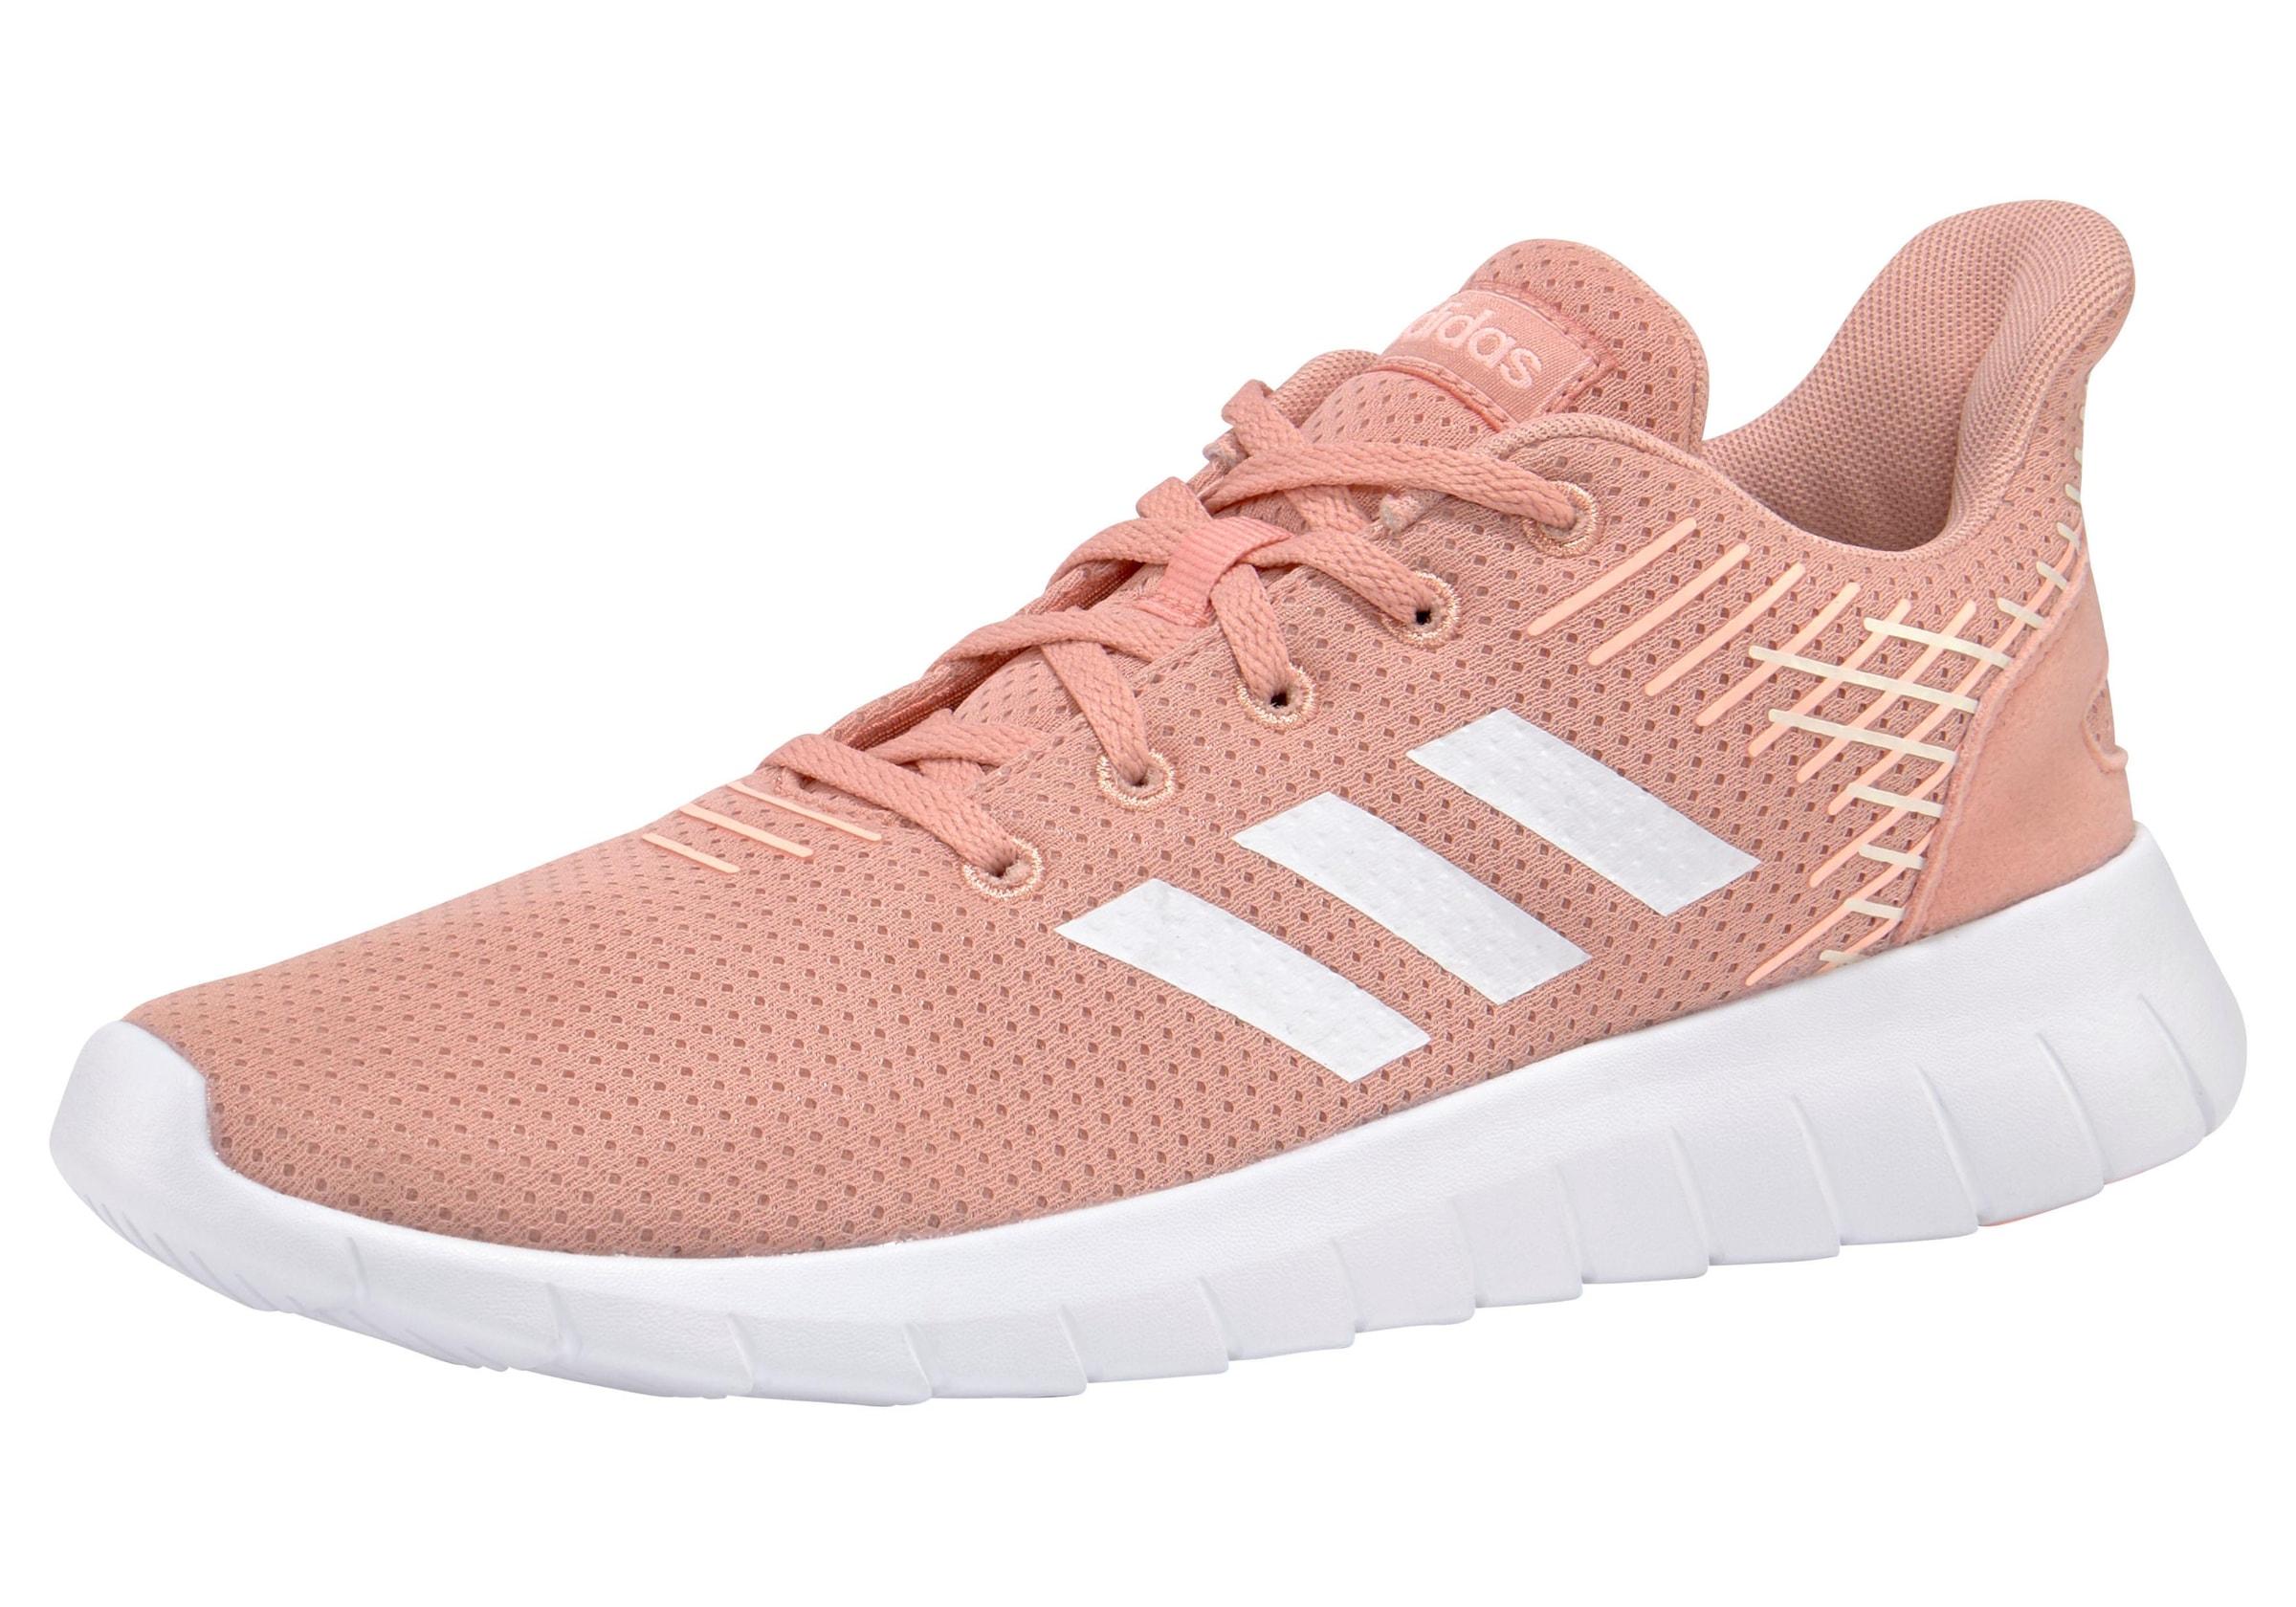 imwalking SALE | Damen Adidas Sneaker Asweerun | 04059808002484